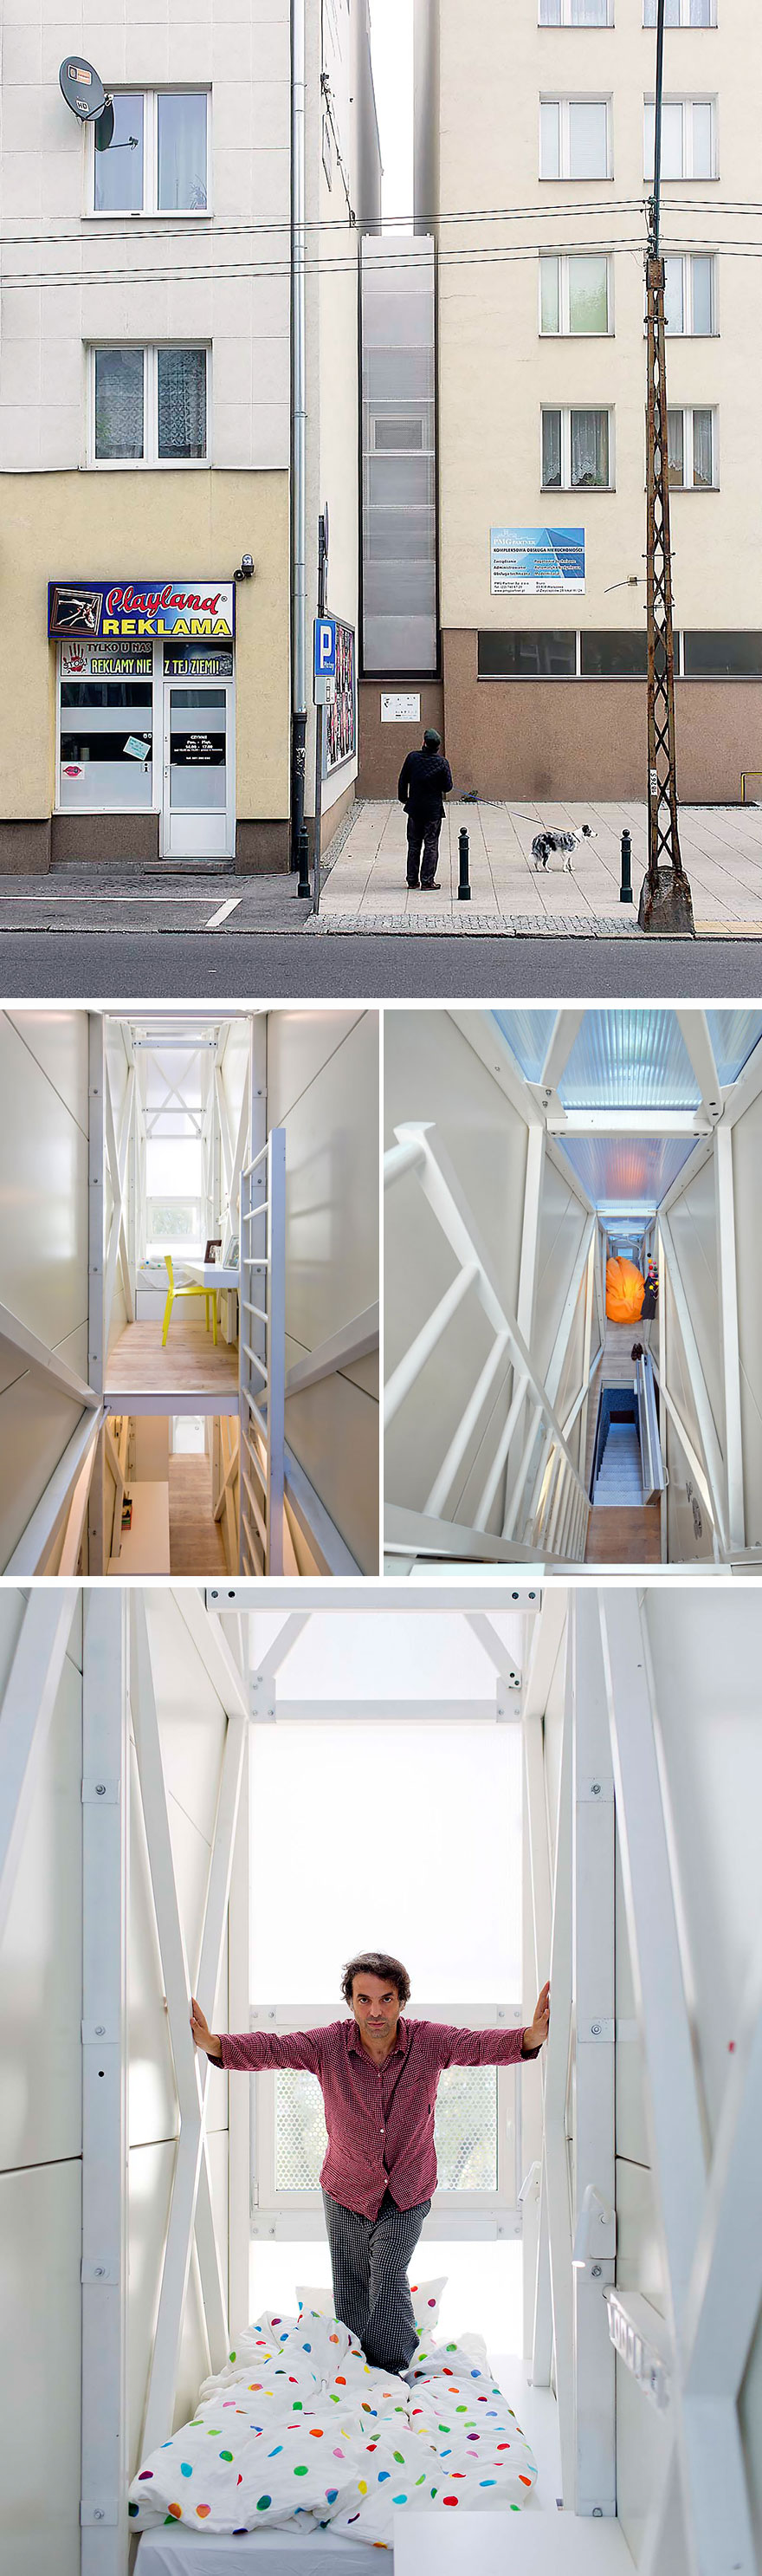 small-houses-saving-space-11__880